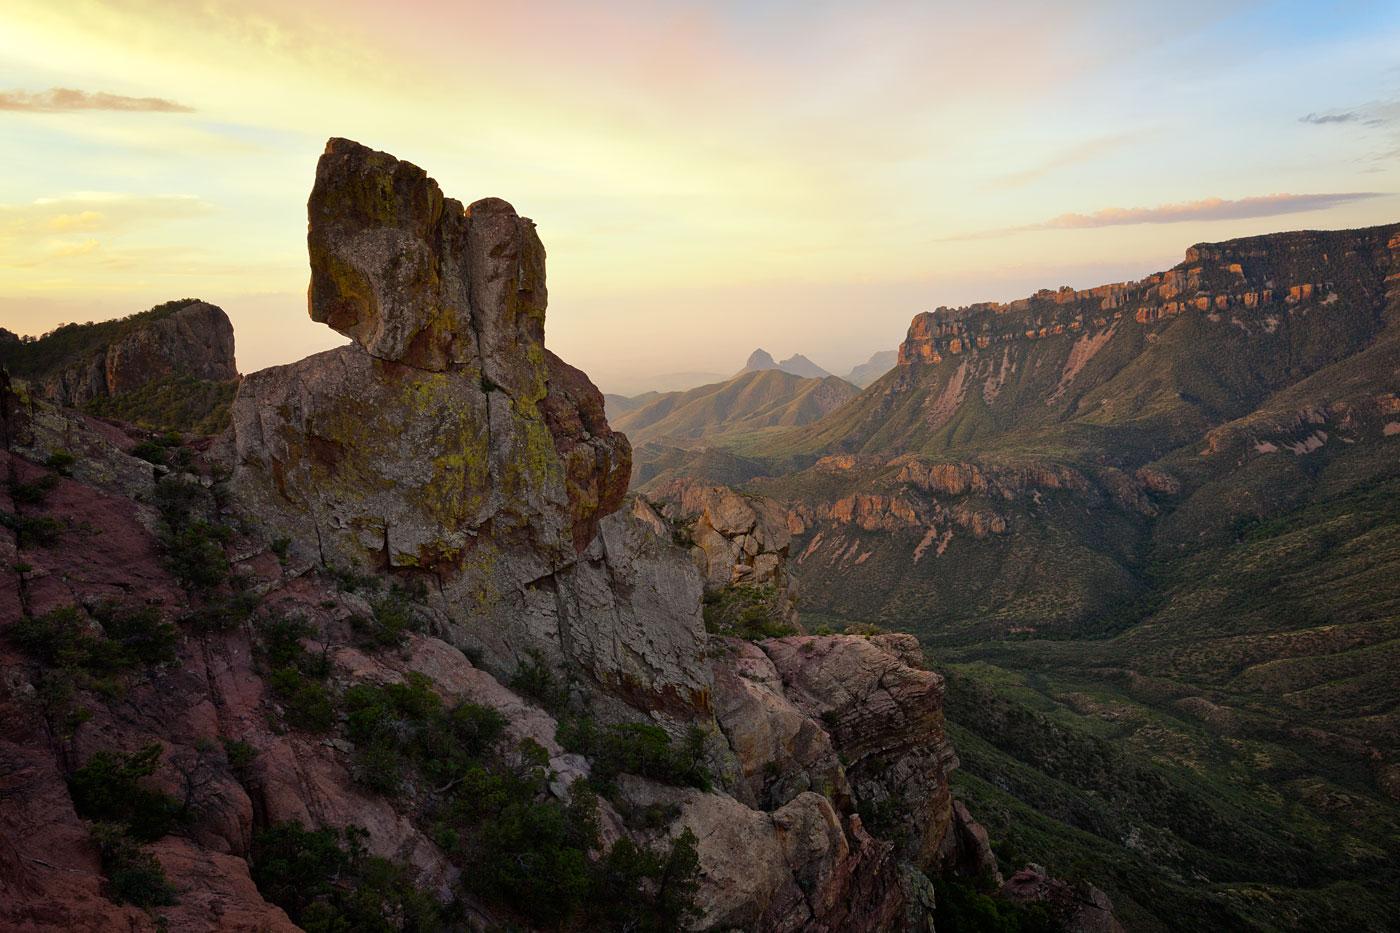 Big-Bend-National-Park-ABP-Lost-Mine-Juniper-Canyon.jpg